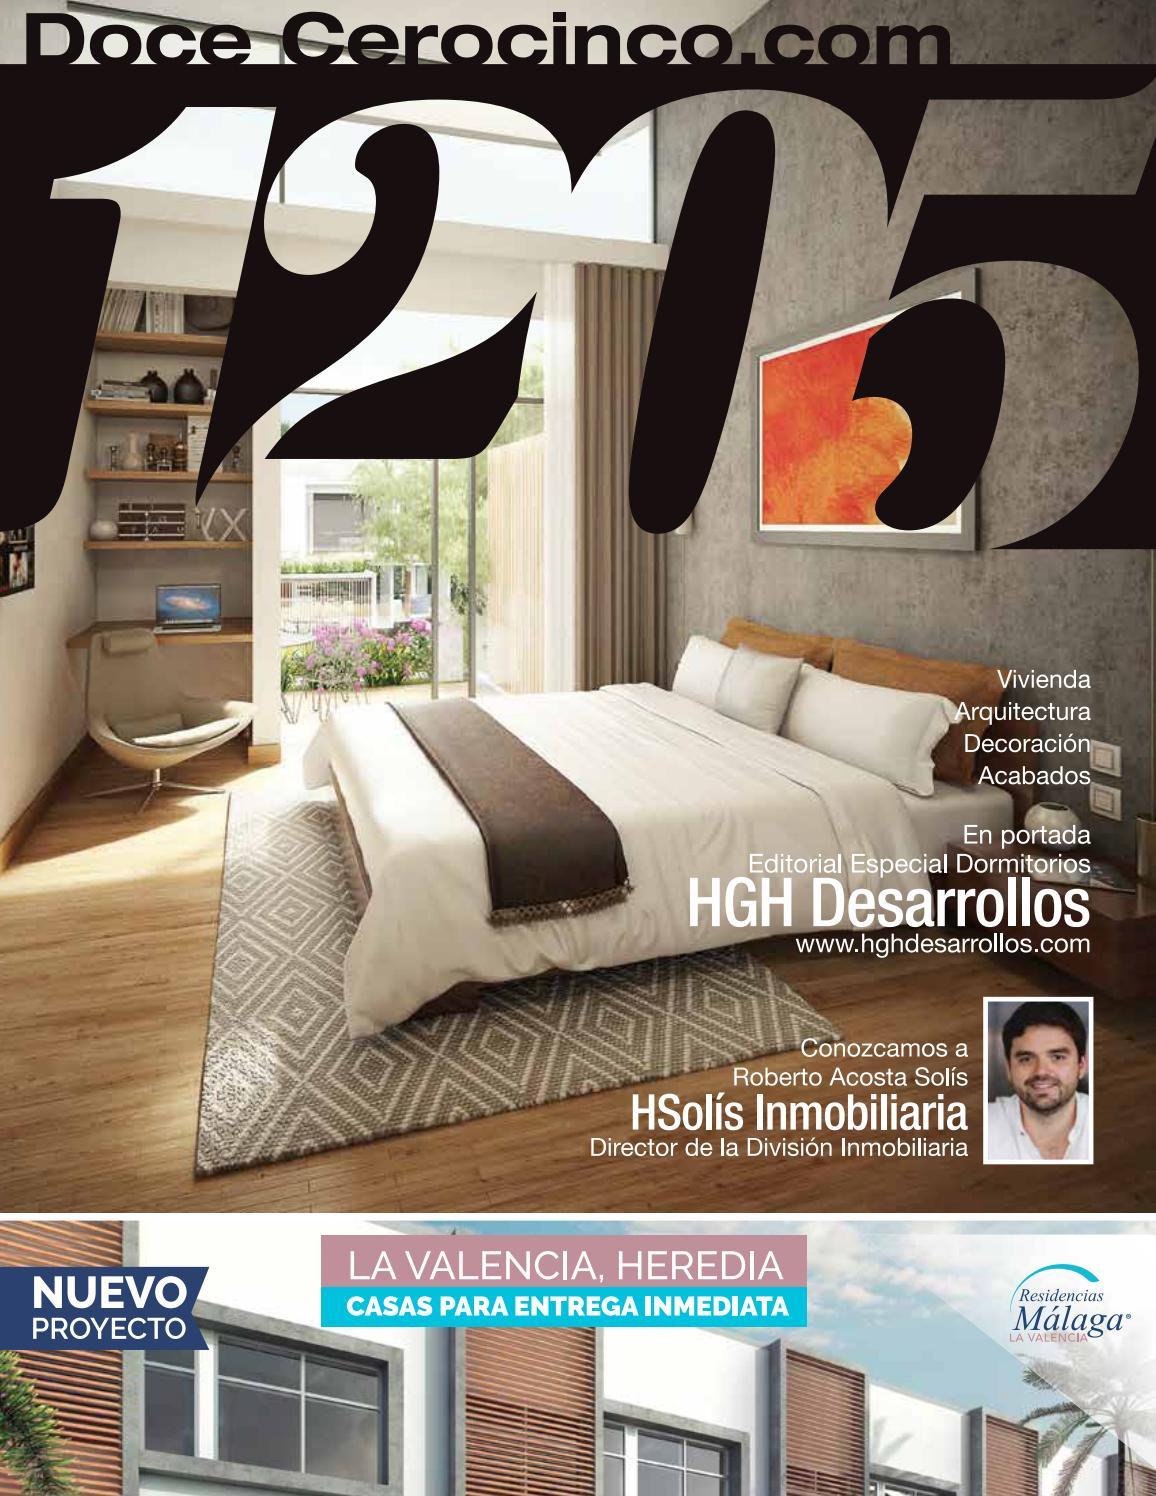 1205 Doce Revista Cerocinco By 1205 Doce Cerocinco Magazine